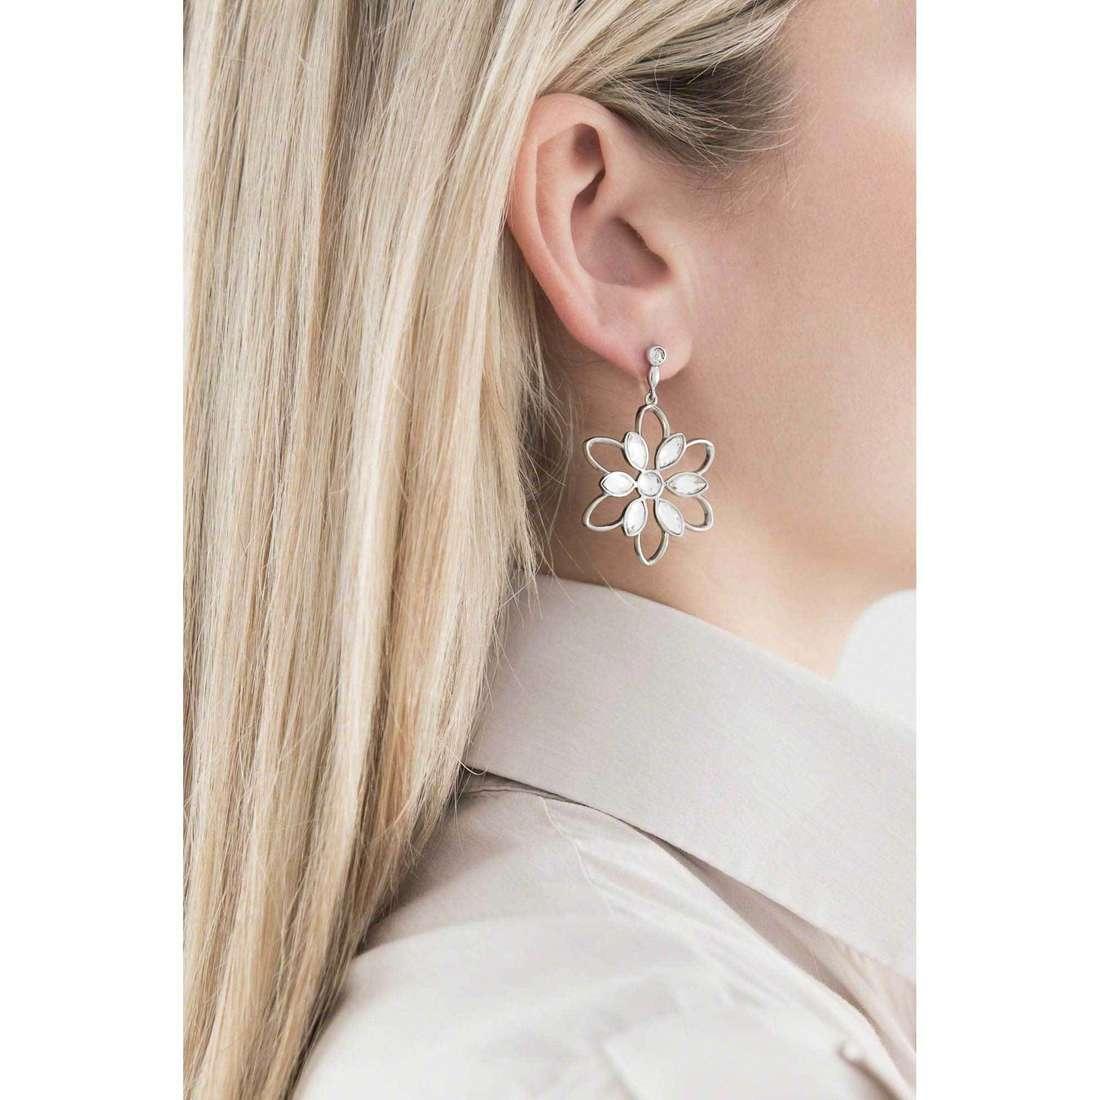 Morellato boucles d'oreille Fioremio femme SABK20 indosso